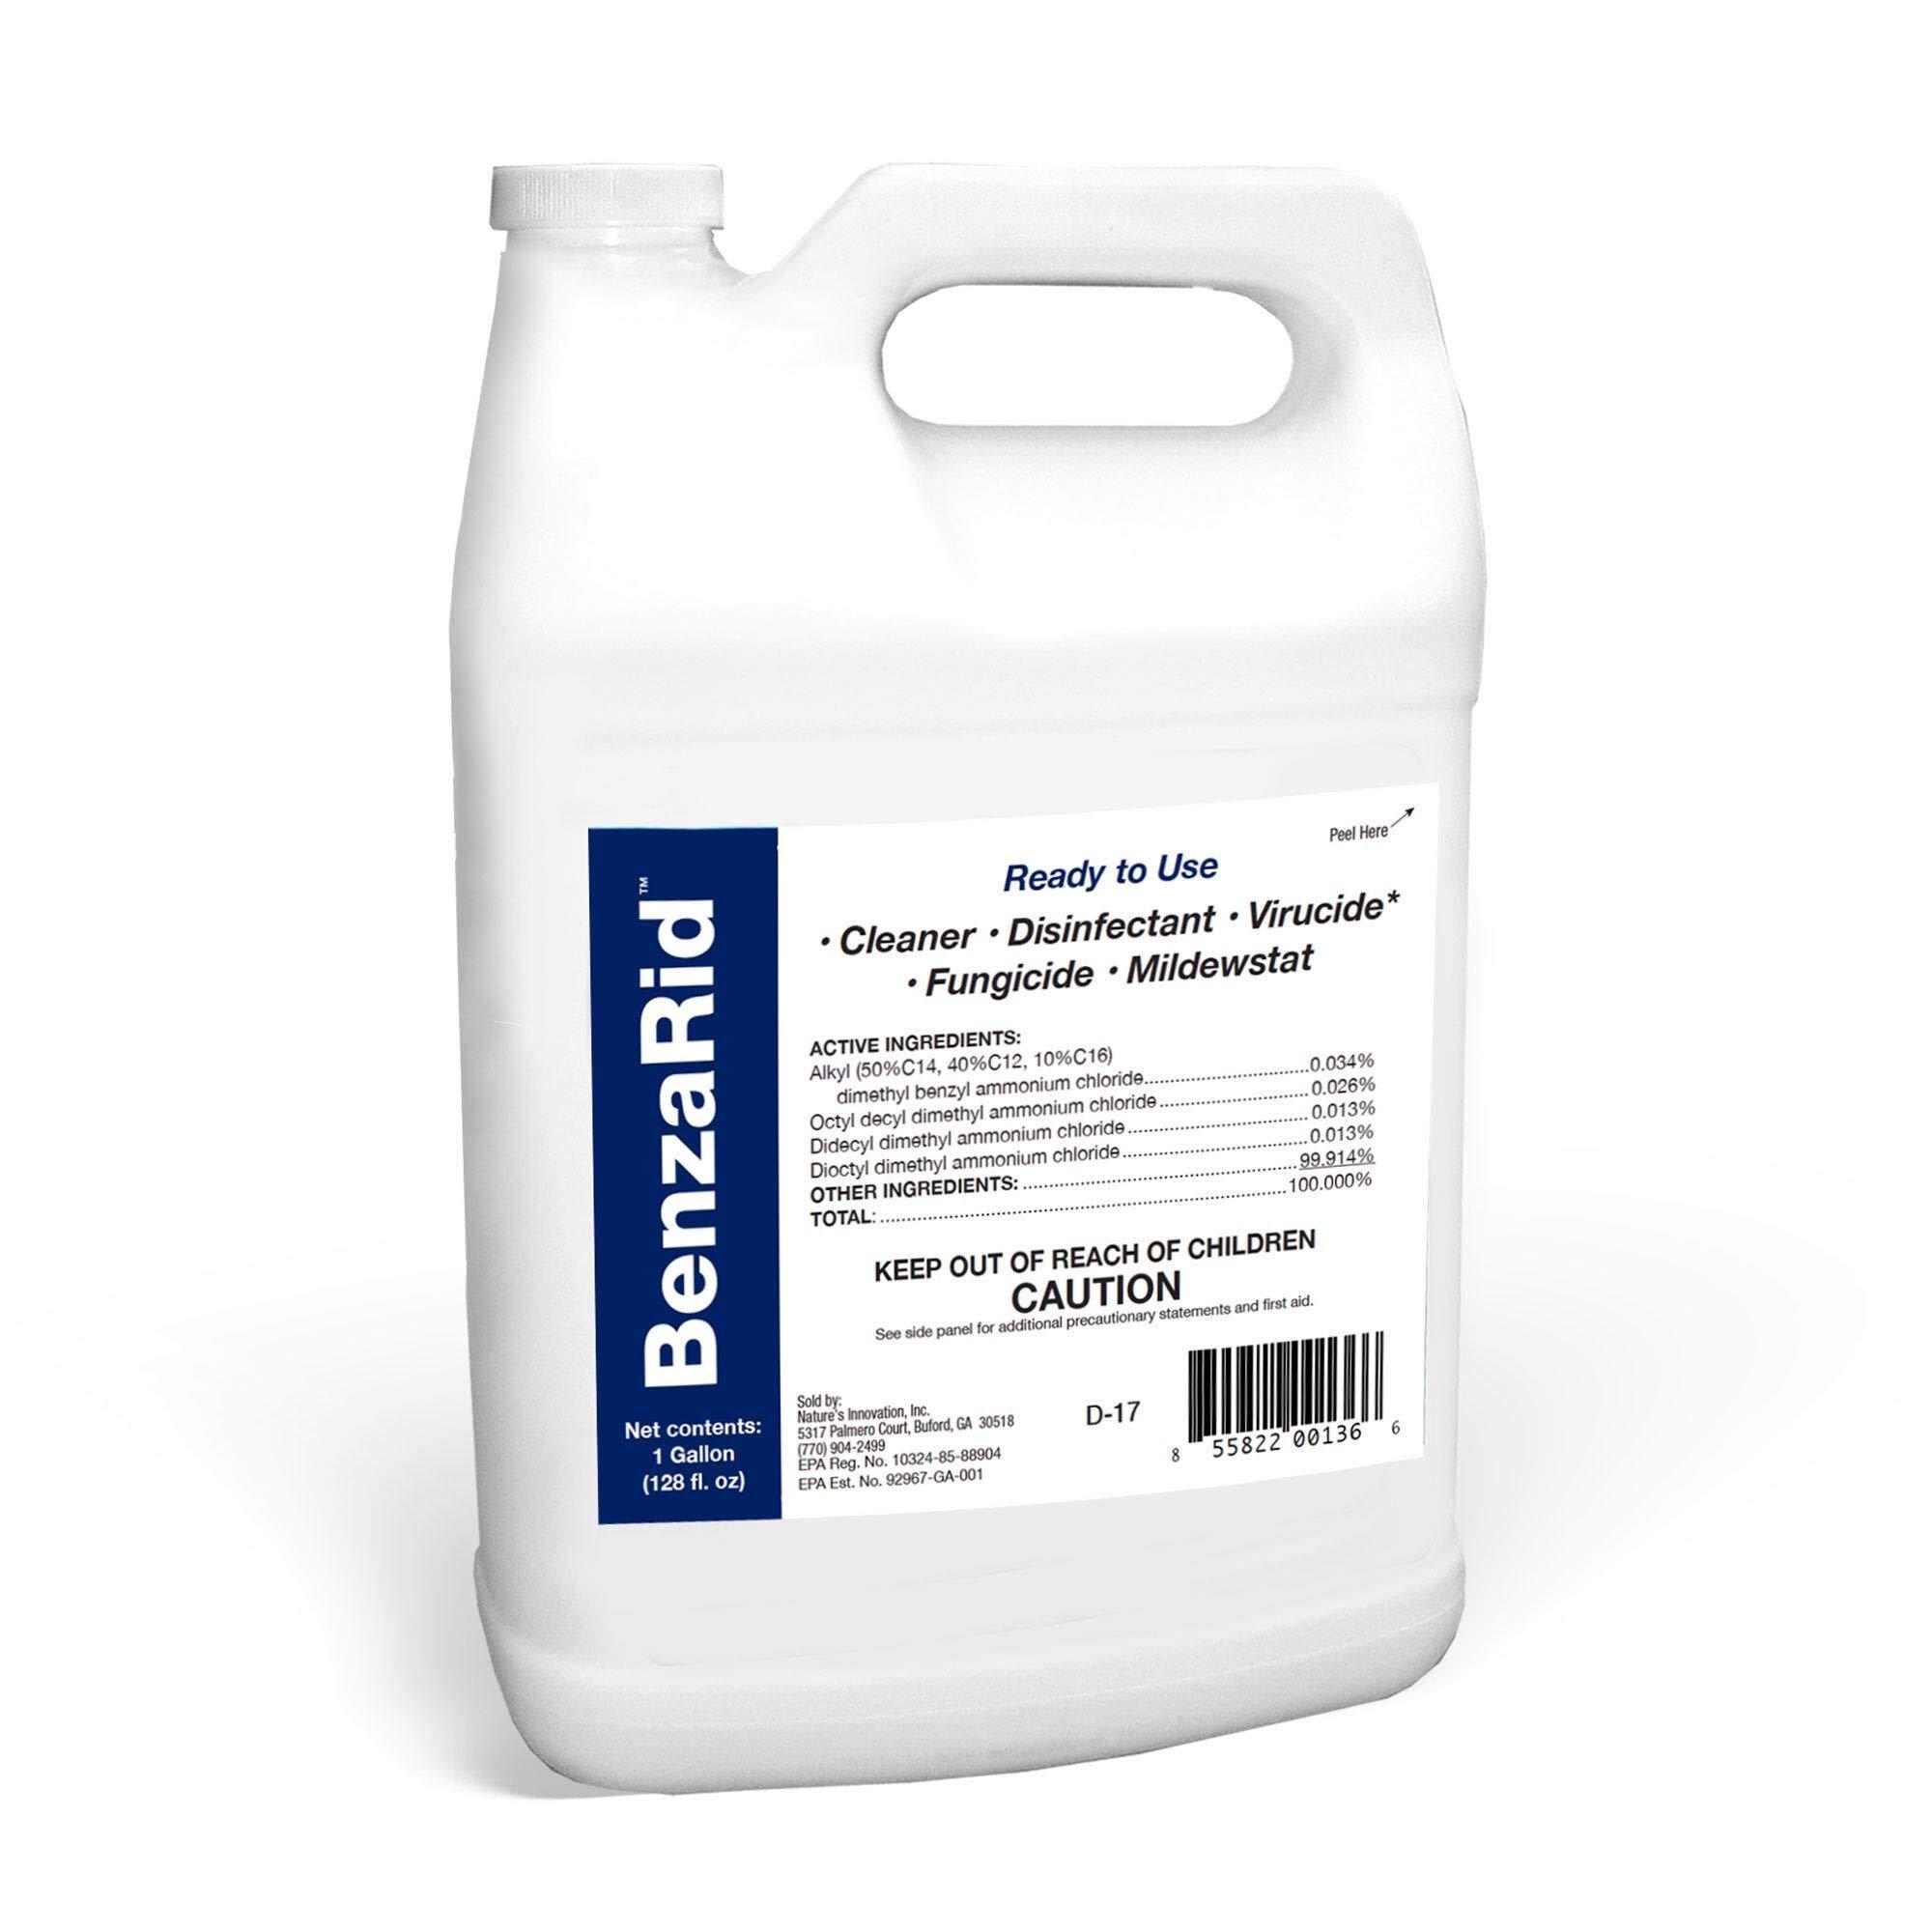 BenzaRid Hospital Grade Disinfectant (1 Gallon) | Professional Sanitizer & Vircucide, Kills MRSA, H1N1, H5N1 Viruses, Avian Flu, Staph, Mites and Blood Born Pathogens | Black Mold Killer, Fungicide